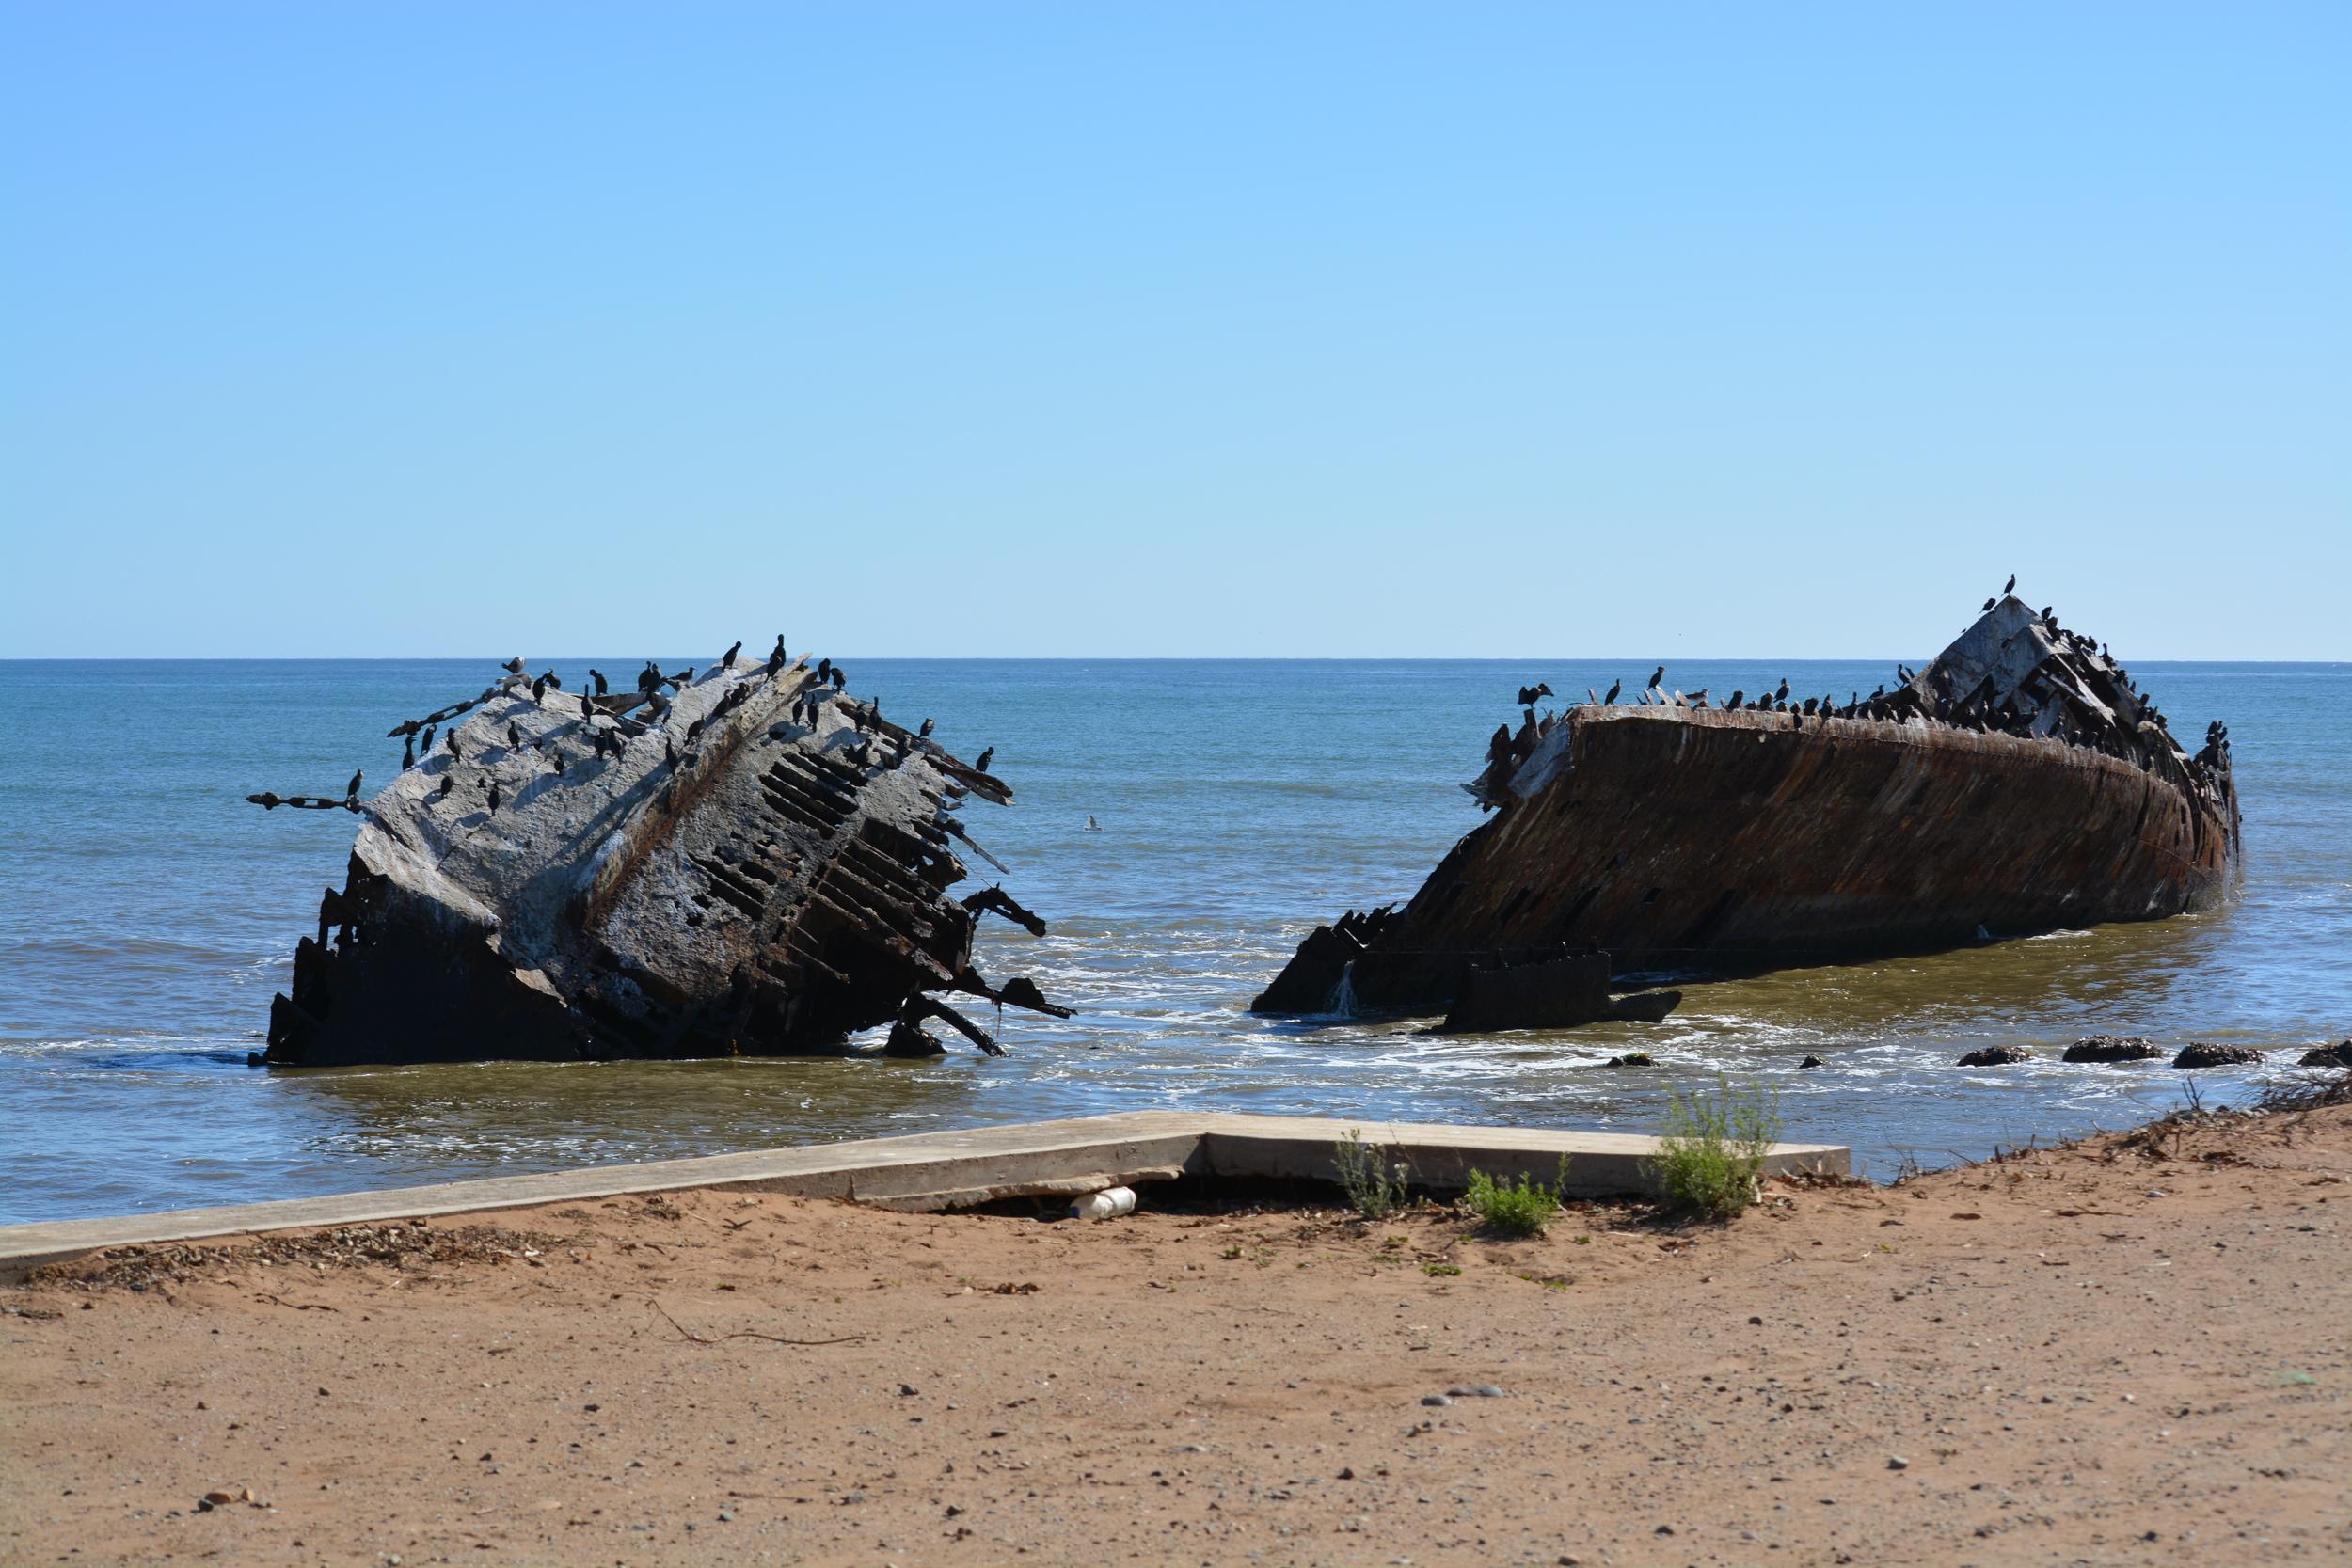 Baja California 10-5-13 Shipwrecks Surfing Adventure Ocean Experience Surf School San Diego (66).JPG